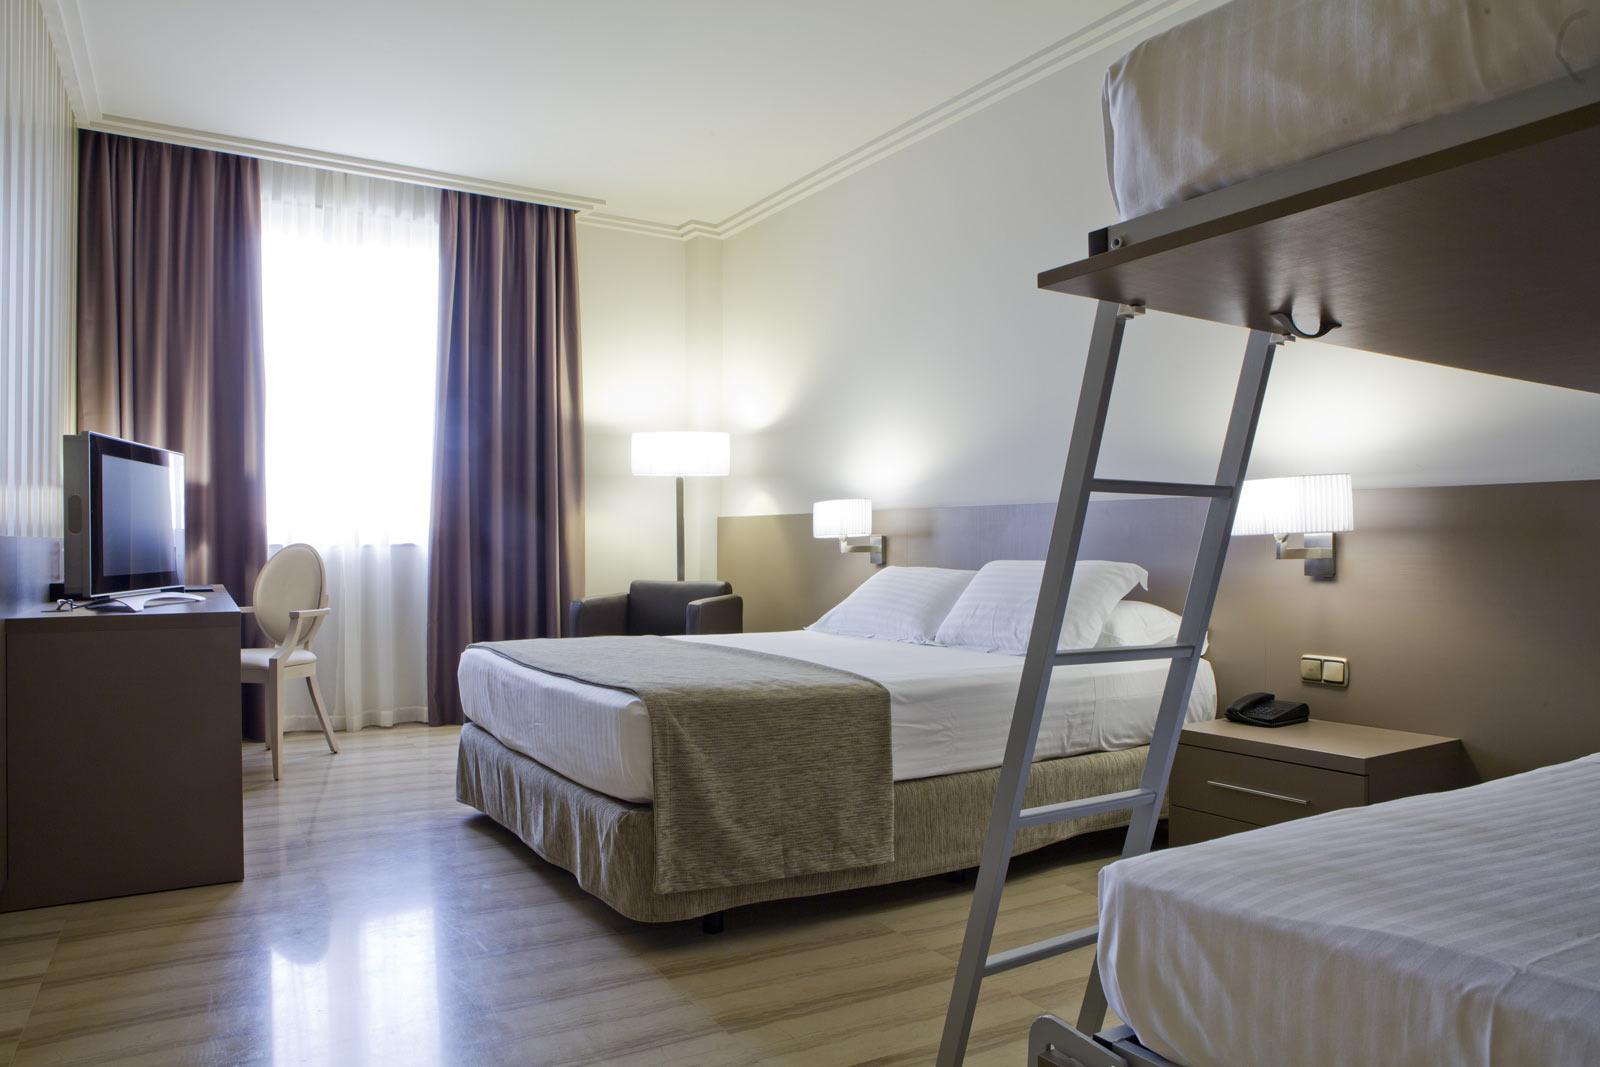 Habitacion cu druple tarragona hotel ciutat de tarragona for Habitacion cuadruple